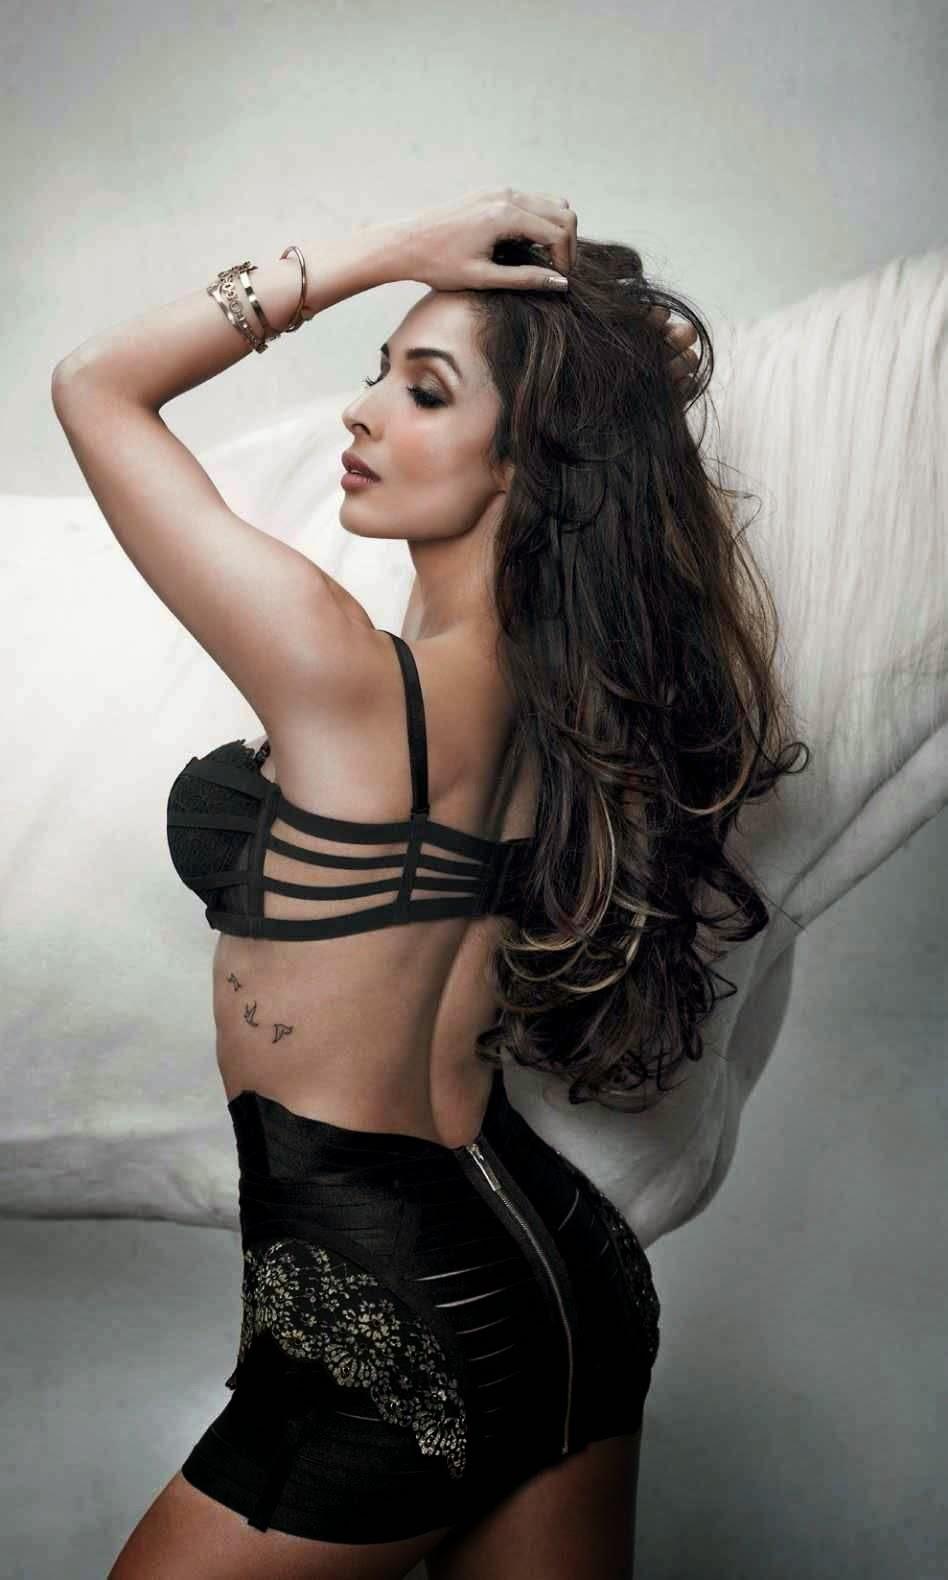 Malaika-Arora-Khan-Hot-Bikini-Photoshoot-For-MAXIM-India-October-Magazine-wallpaper-wp5209128